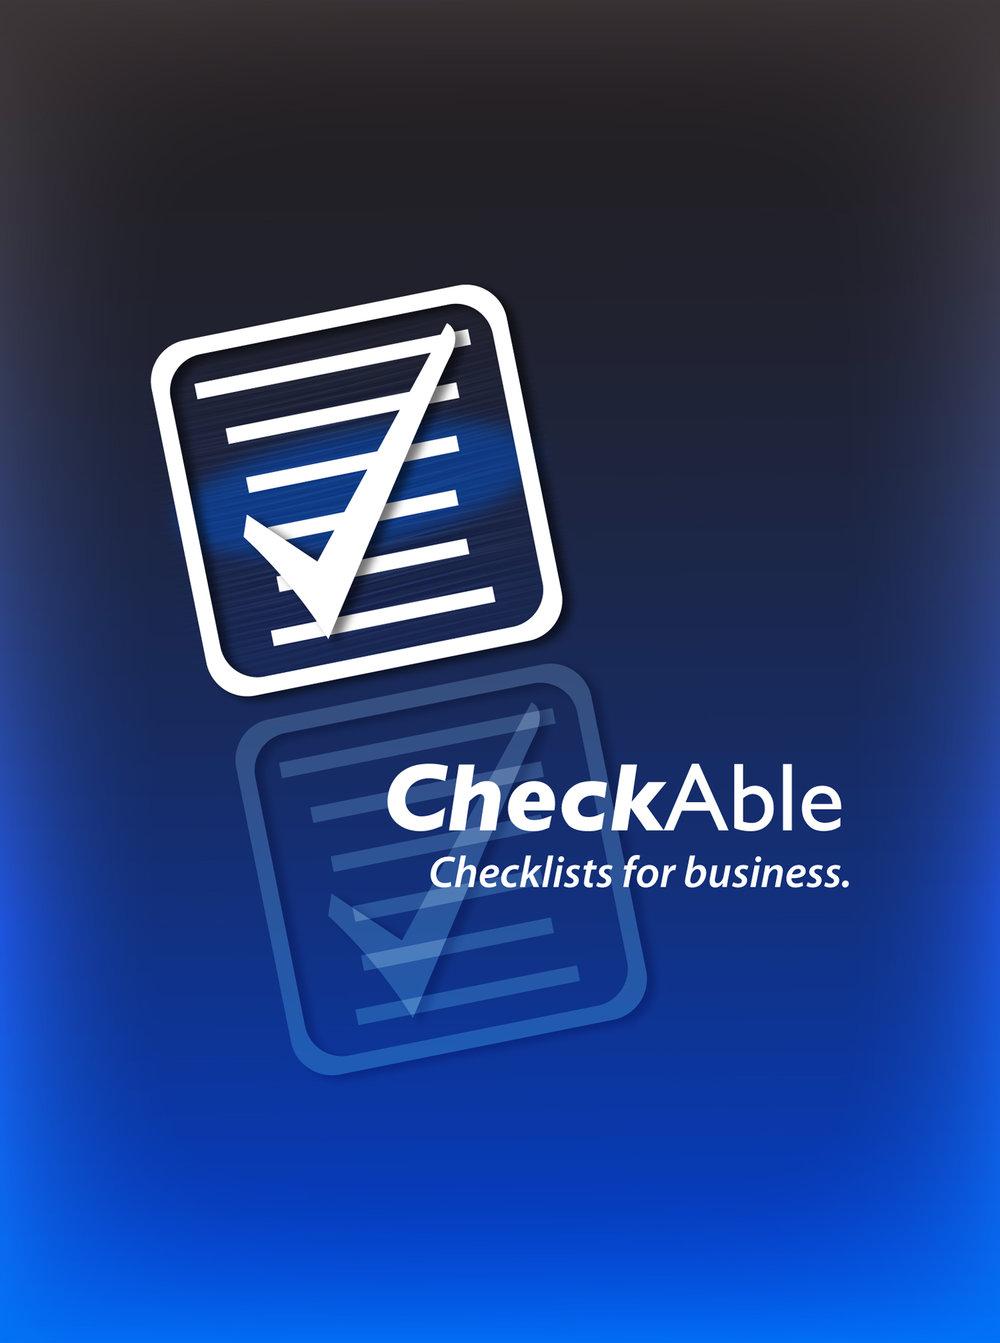 Graphics & Logo for Checkable Mobile App.